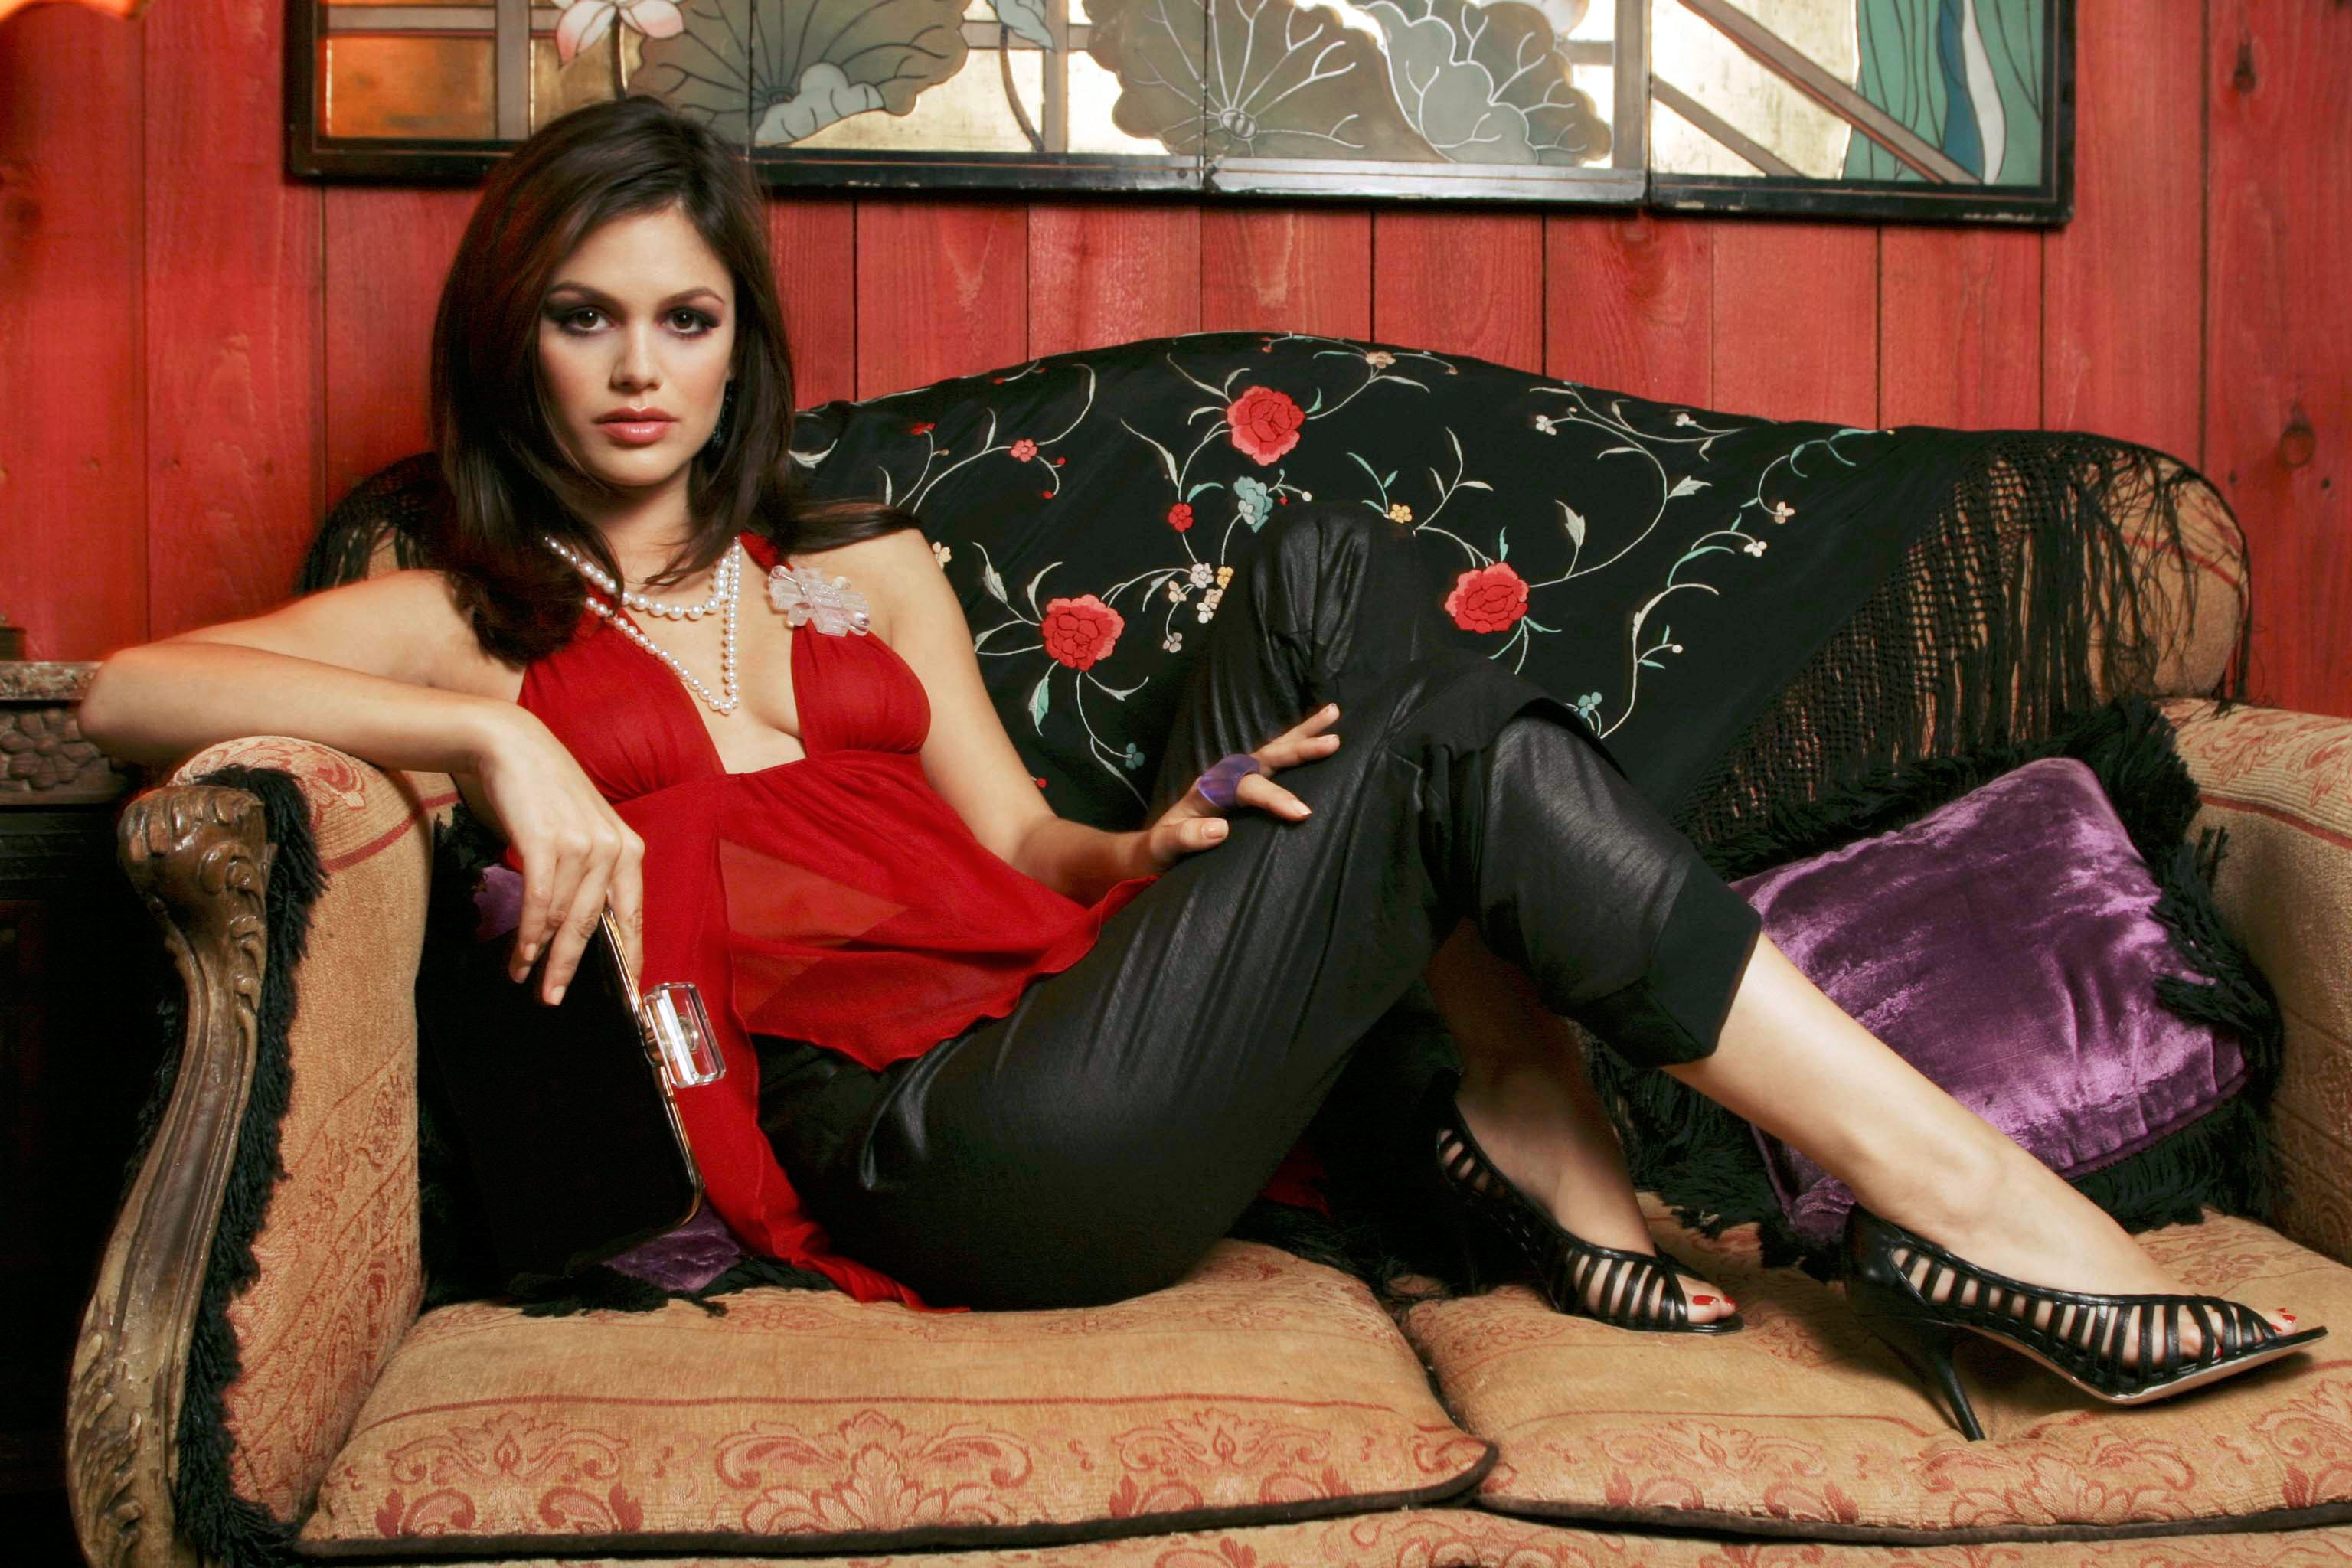 Wallpaper: Rachel Bilson sul divano